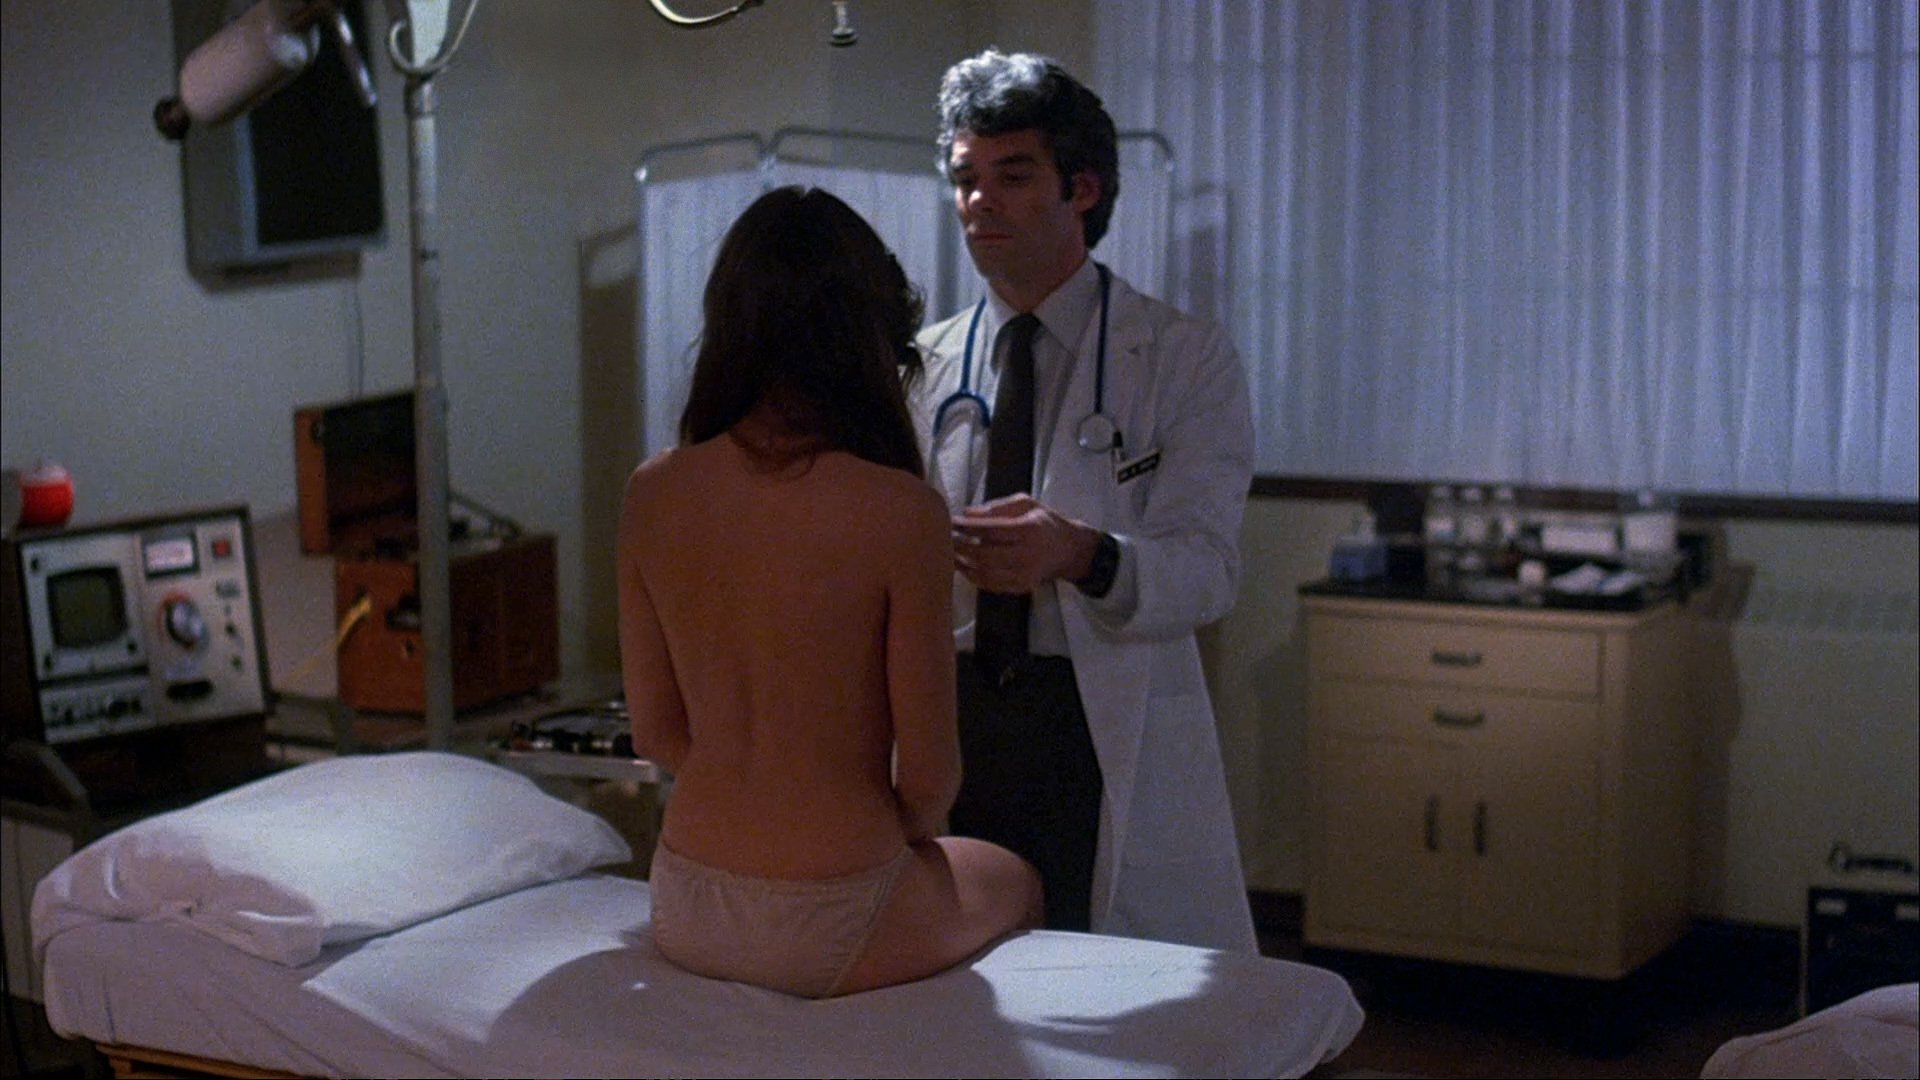 Me, Lori davis breast exam simply ridiculous